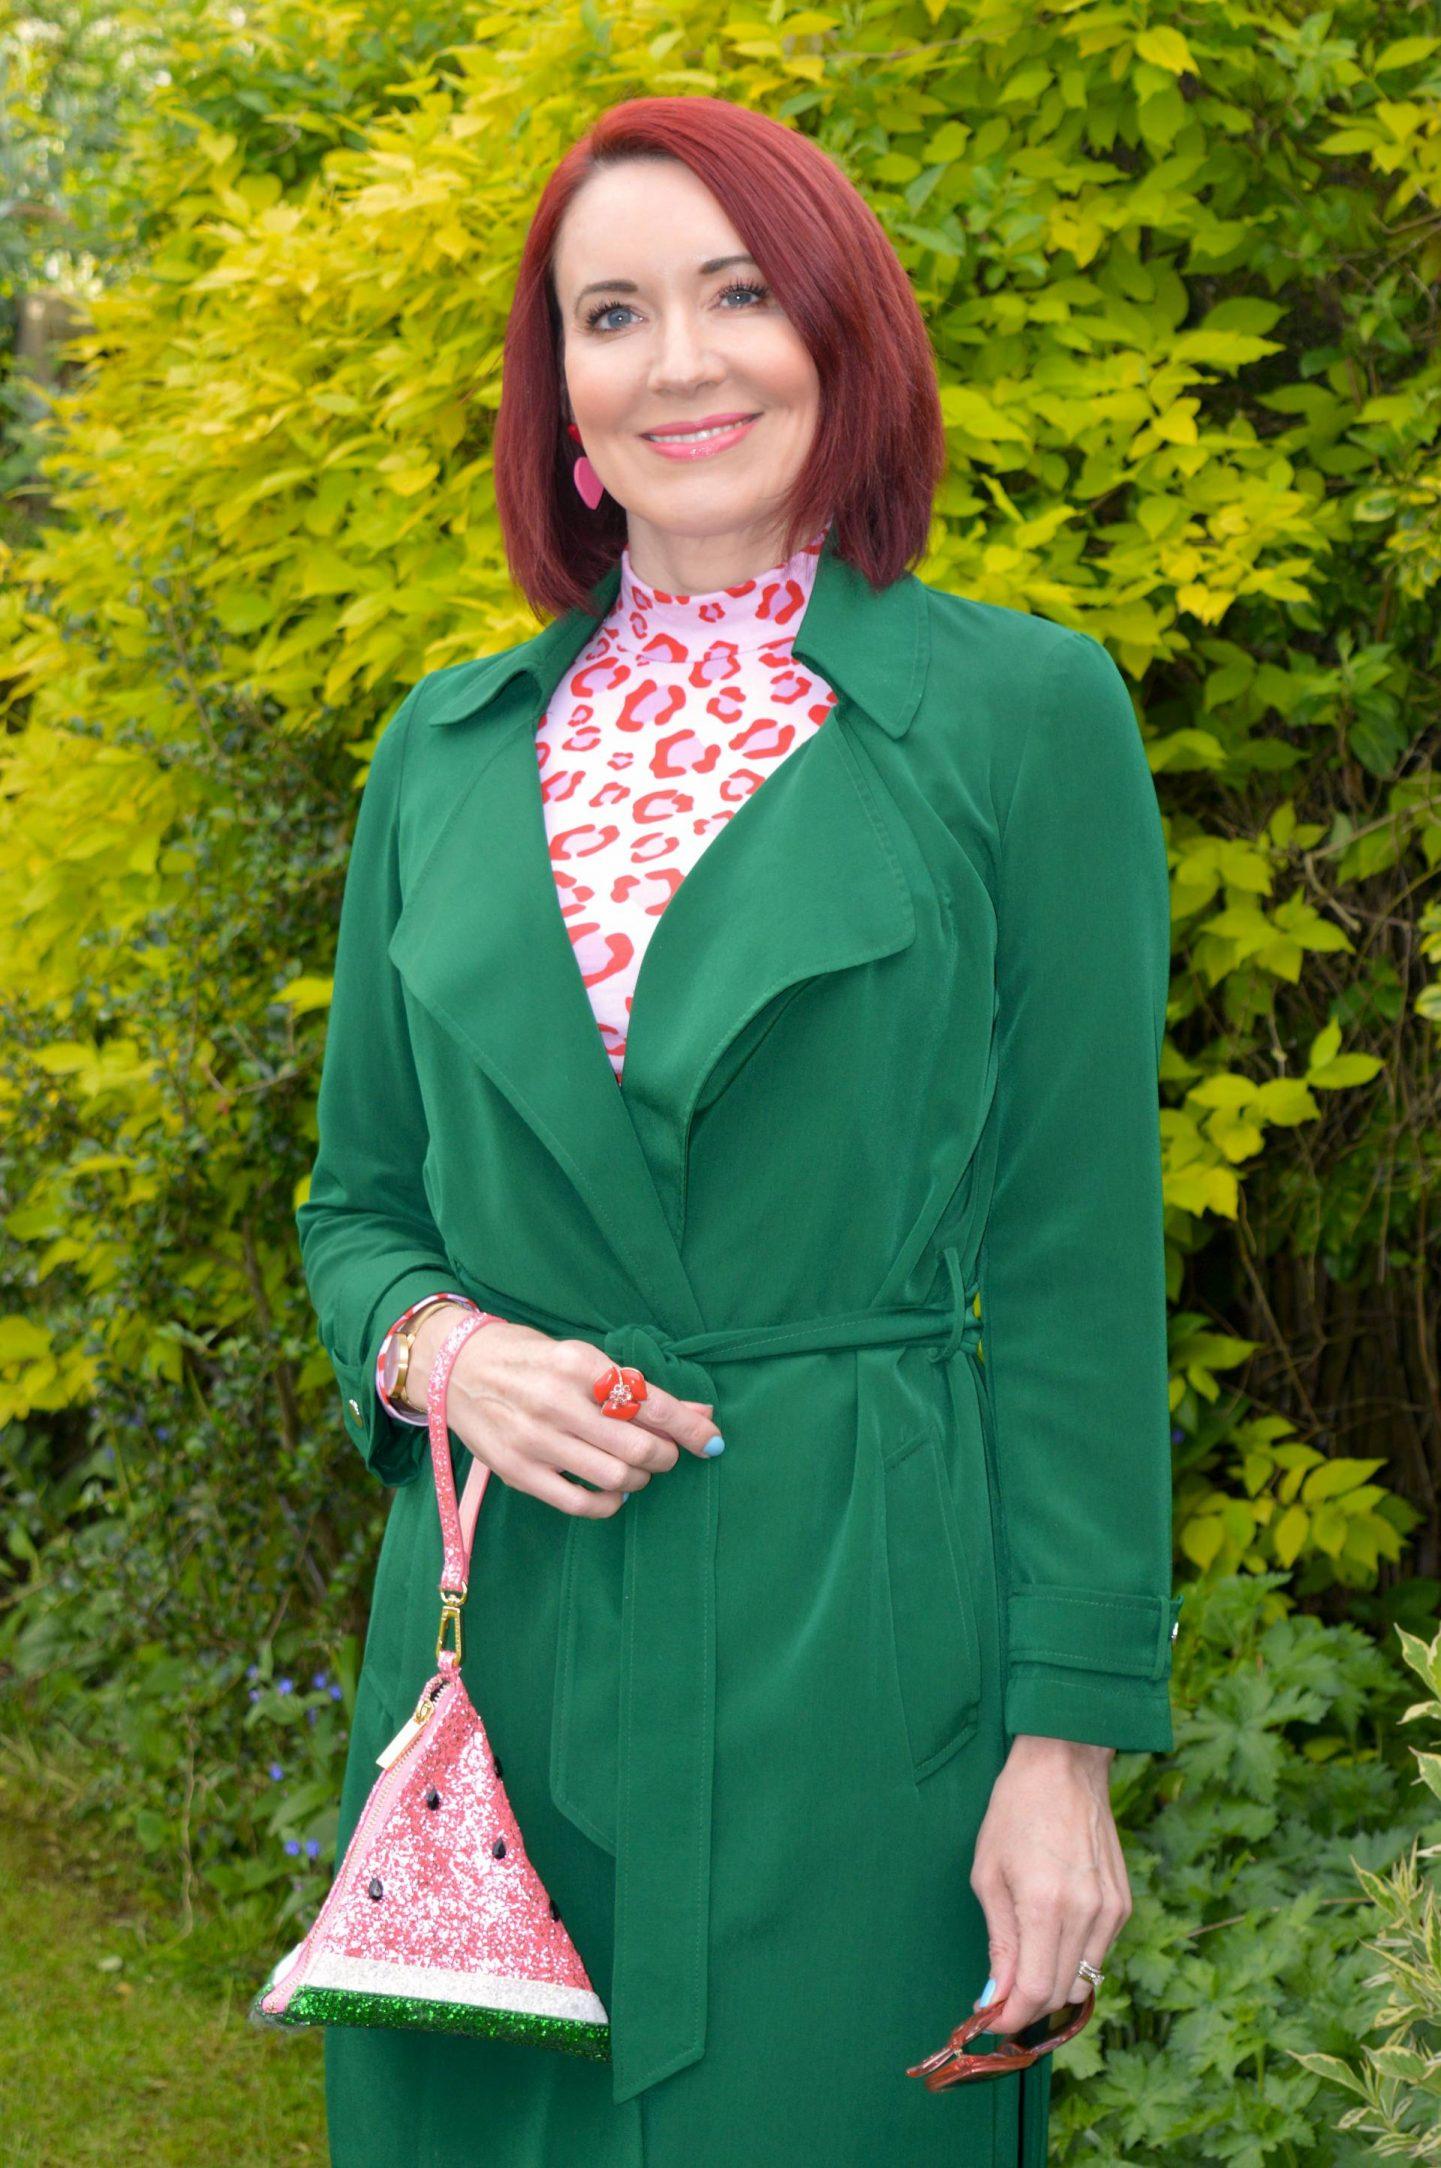 Green and Pink Animal Print, Saturday by Megan Ellaby Hazel pink animal print top, Skinny Dip glitter warermelon bag, Papaya green trench coat